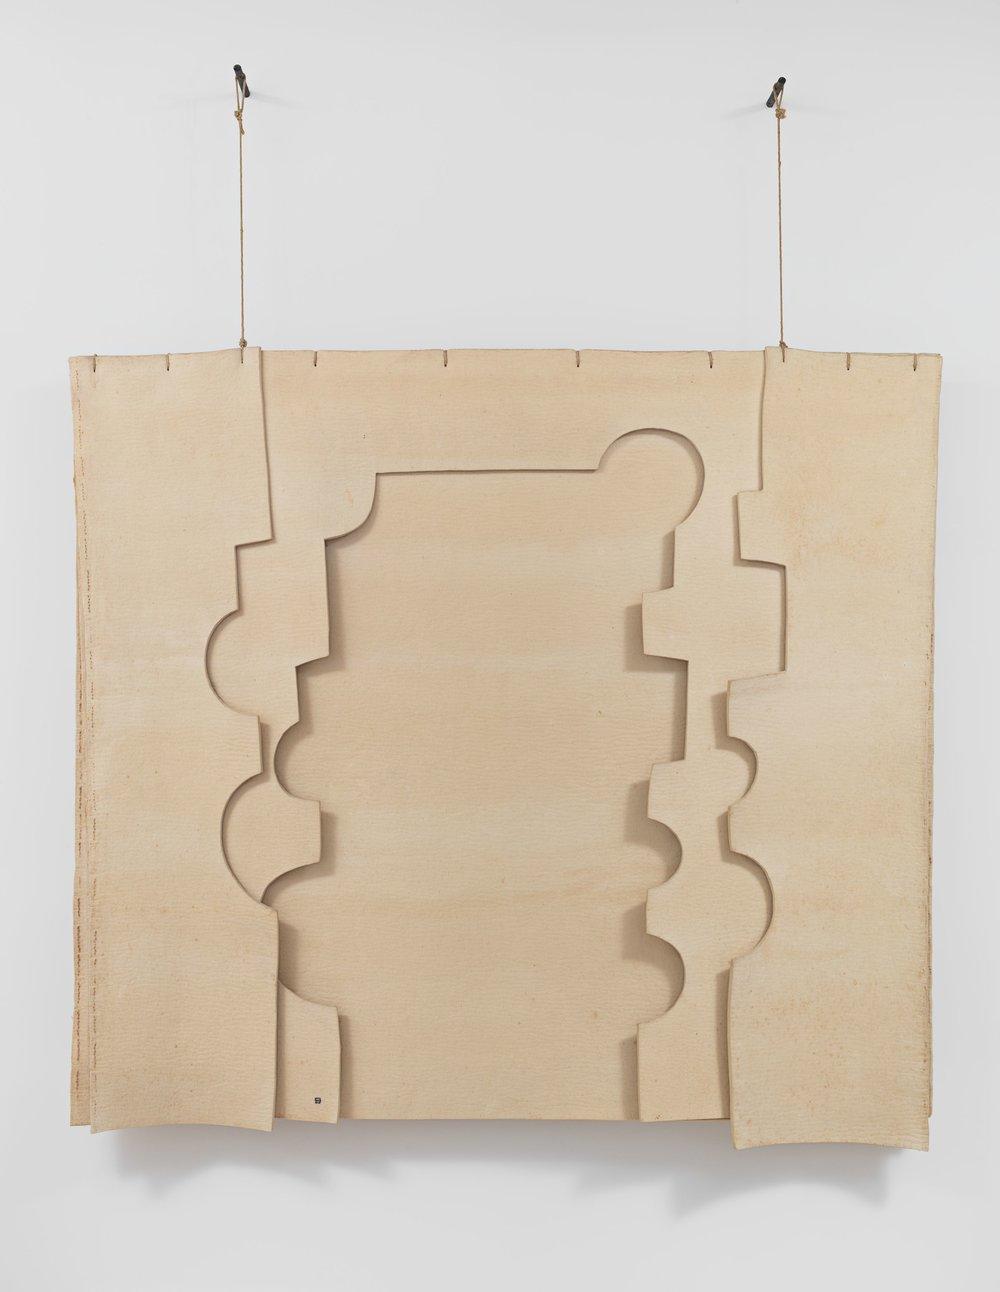 Eduardo Chillida Gravitación (Gravitation) 1990 Felt 179.2 x 194.2 cm / 70 1/2 x 76 1/2 in